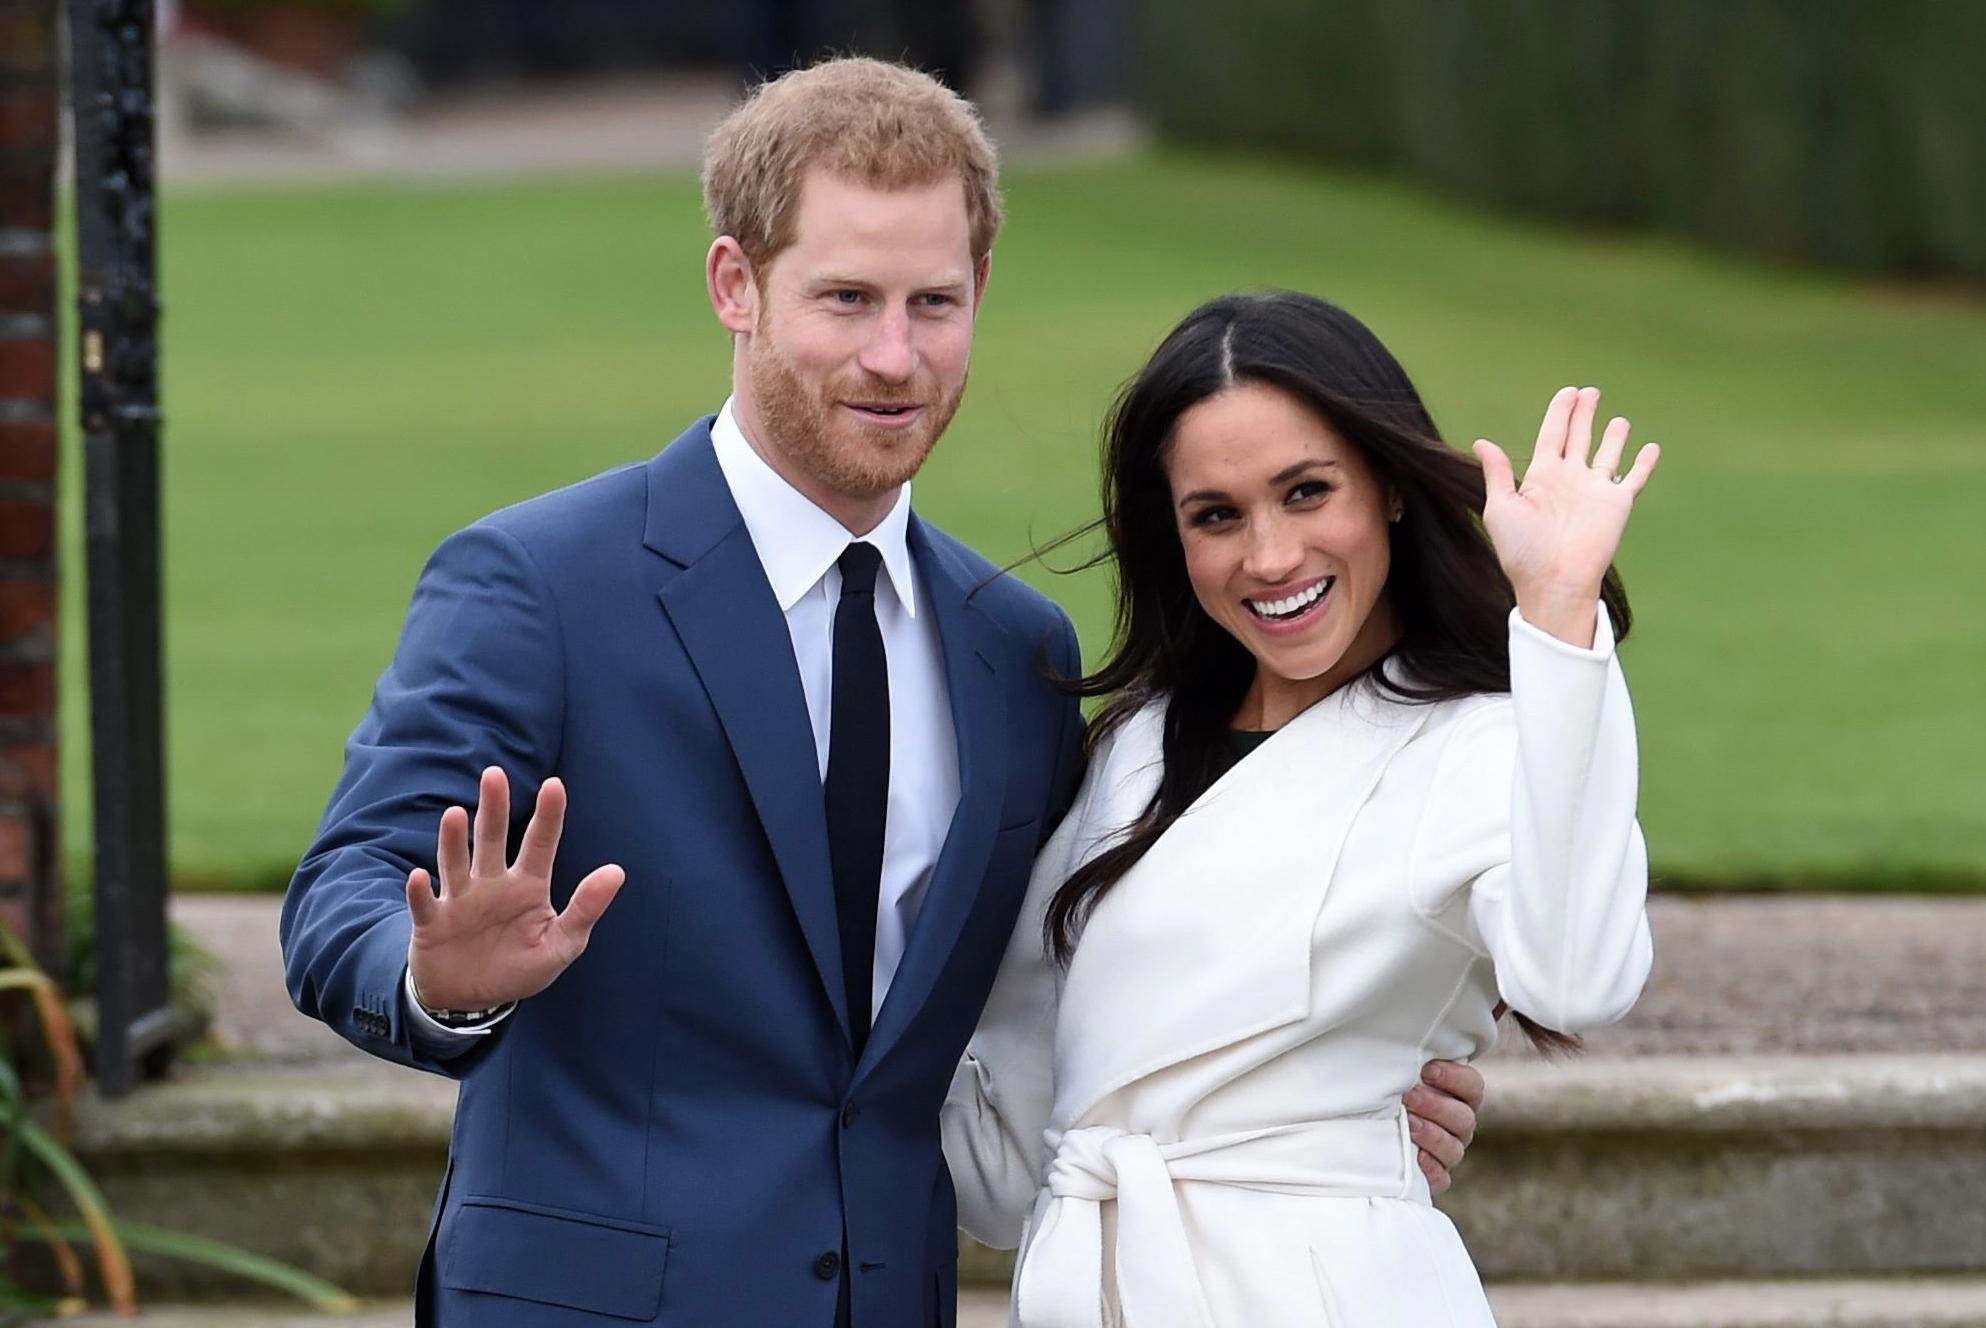 Royal_Wedding-Meghan_Markle_77446-159532.jpg71857663